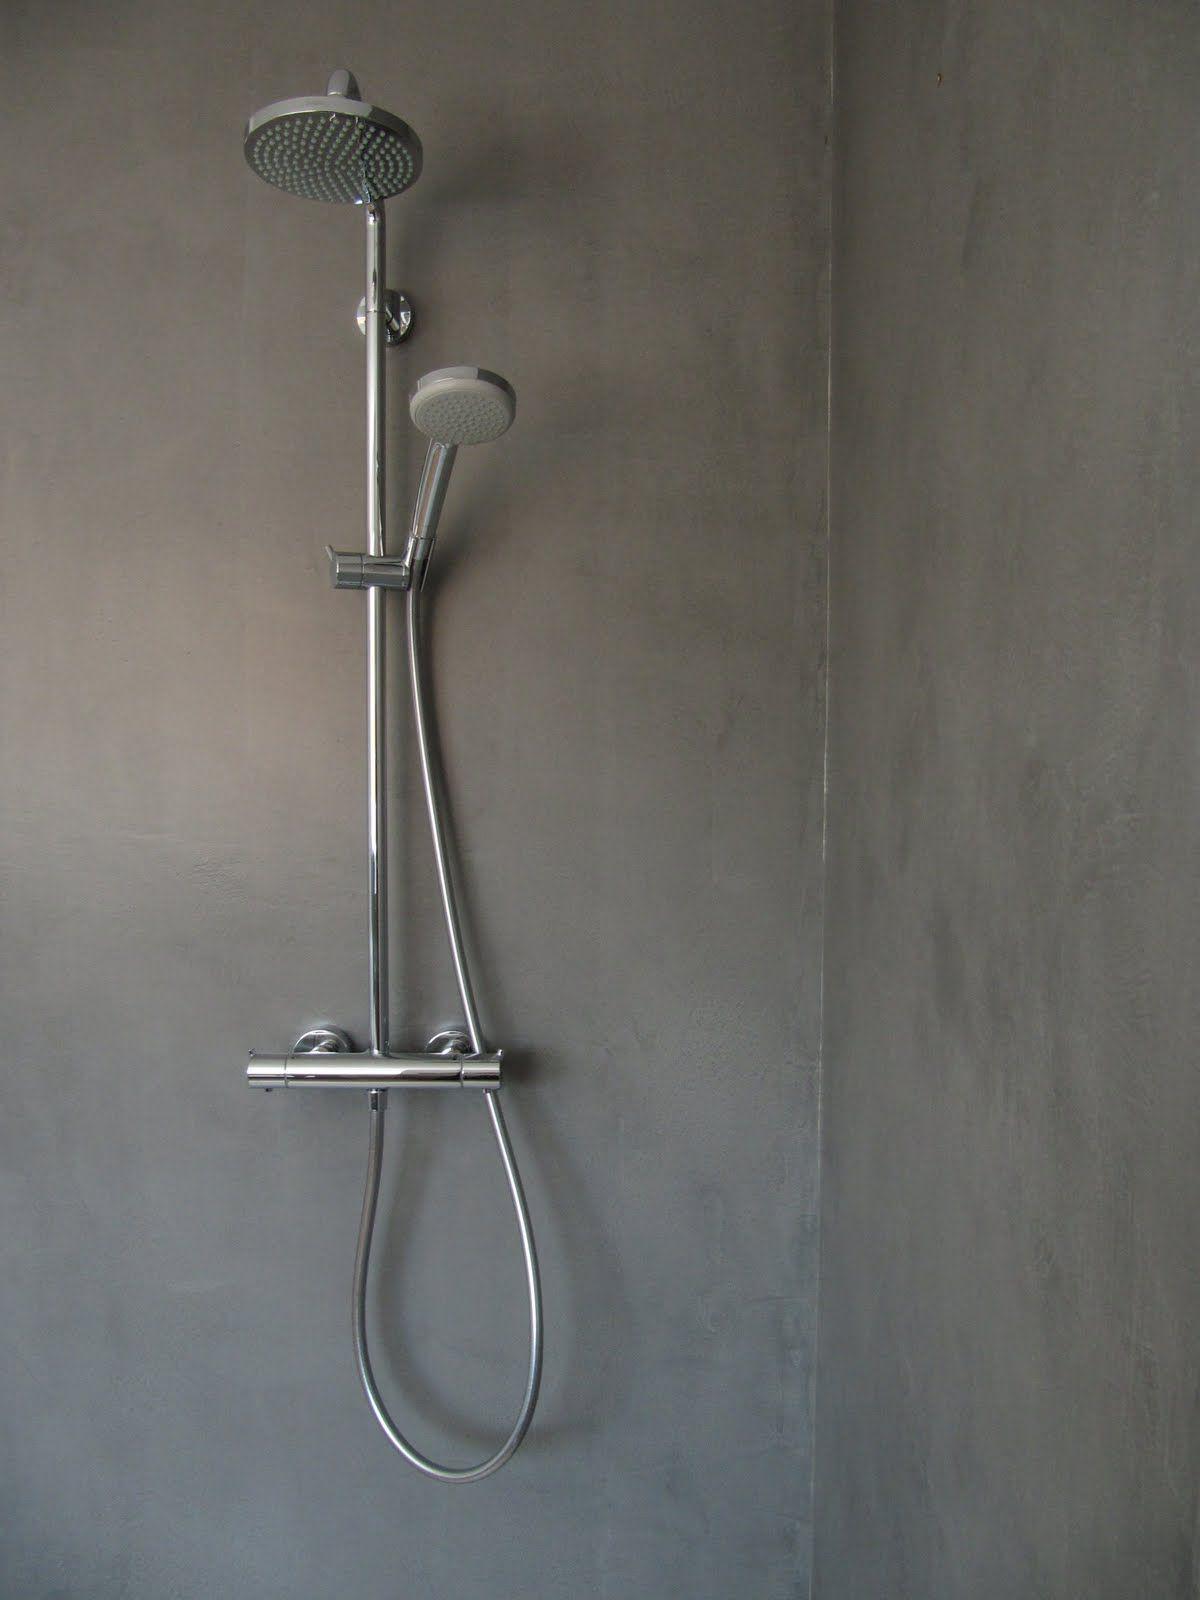 wir fertigen tadelaktbeschichtete waschschalen und waschtische ... - Wandbeschichtung Küche